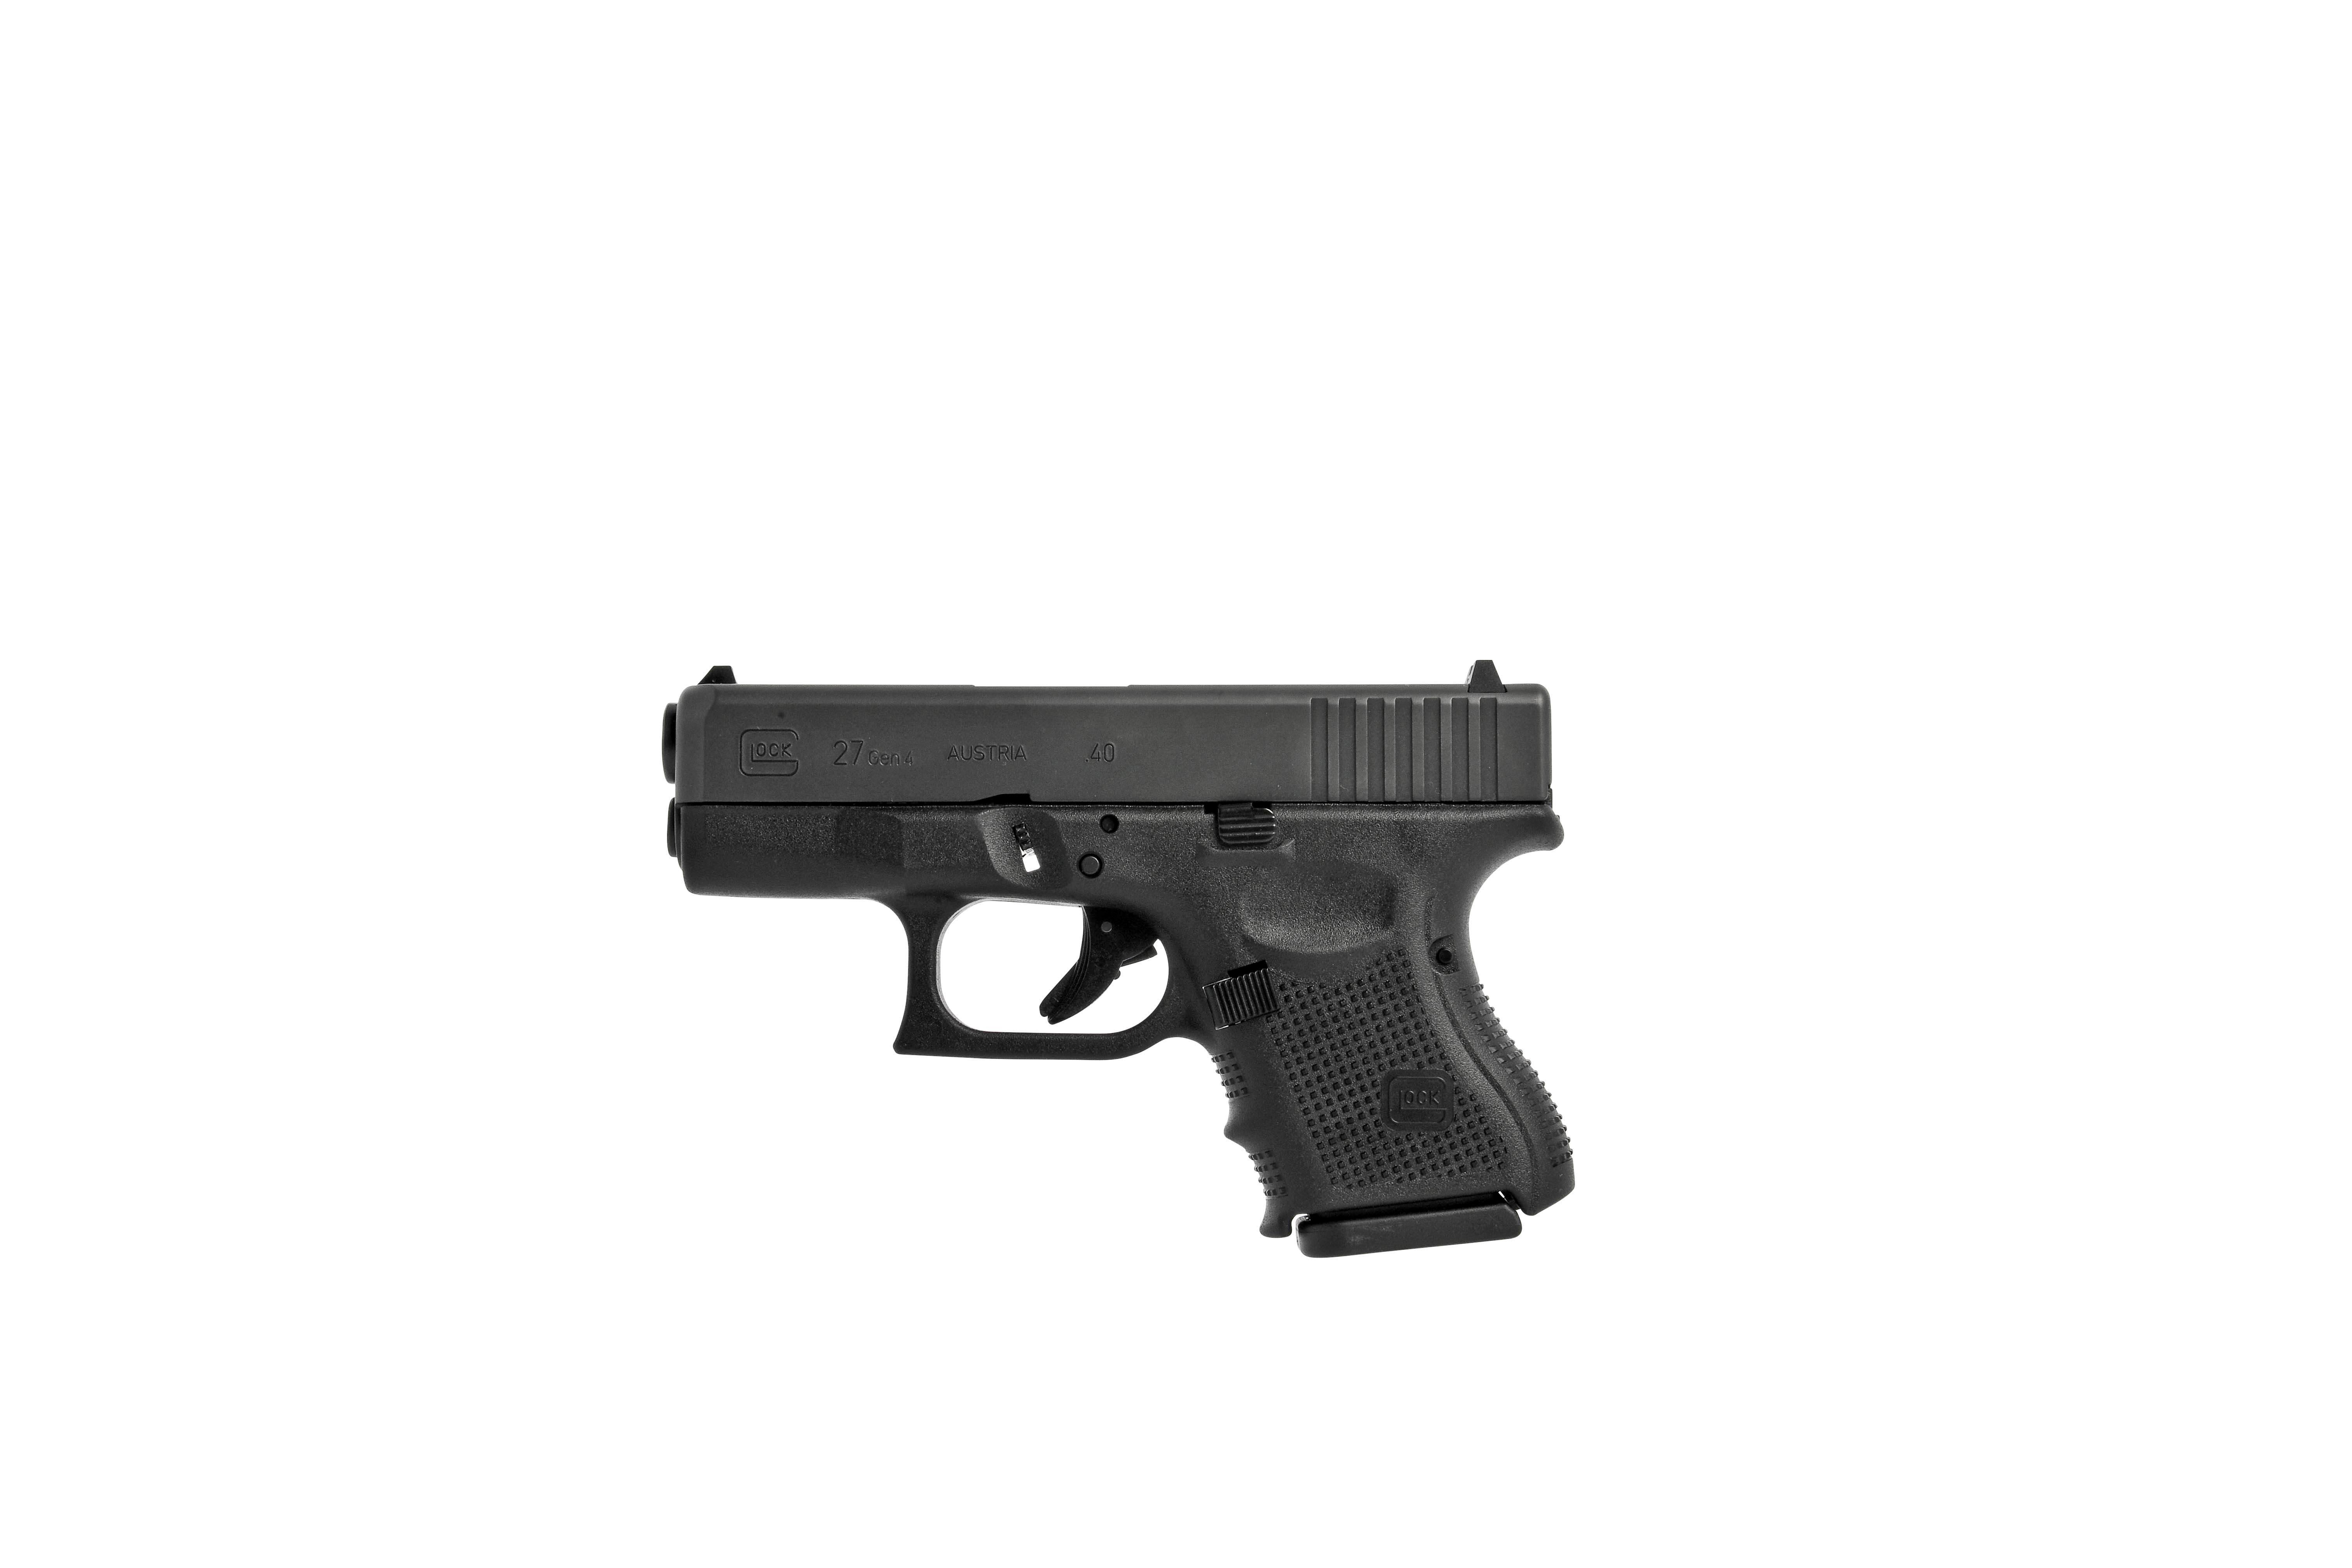 GLOCK Handgun G27 Gen4